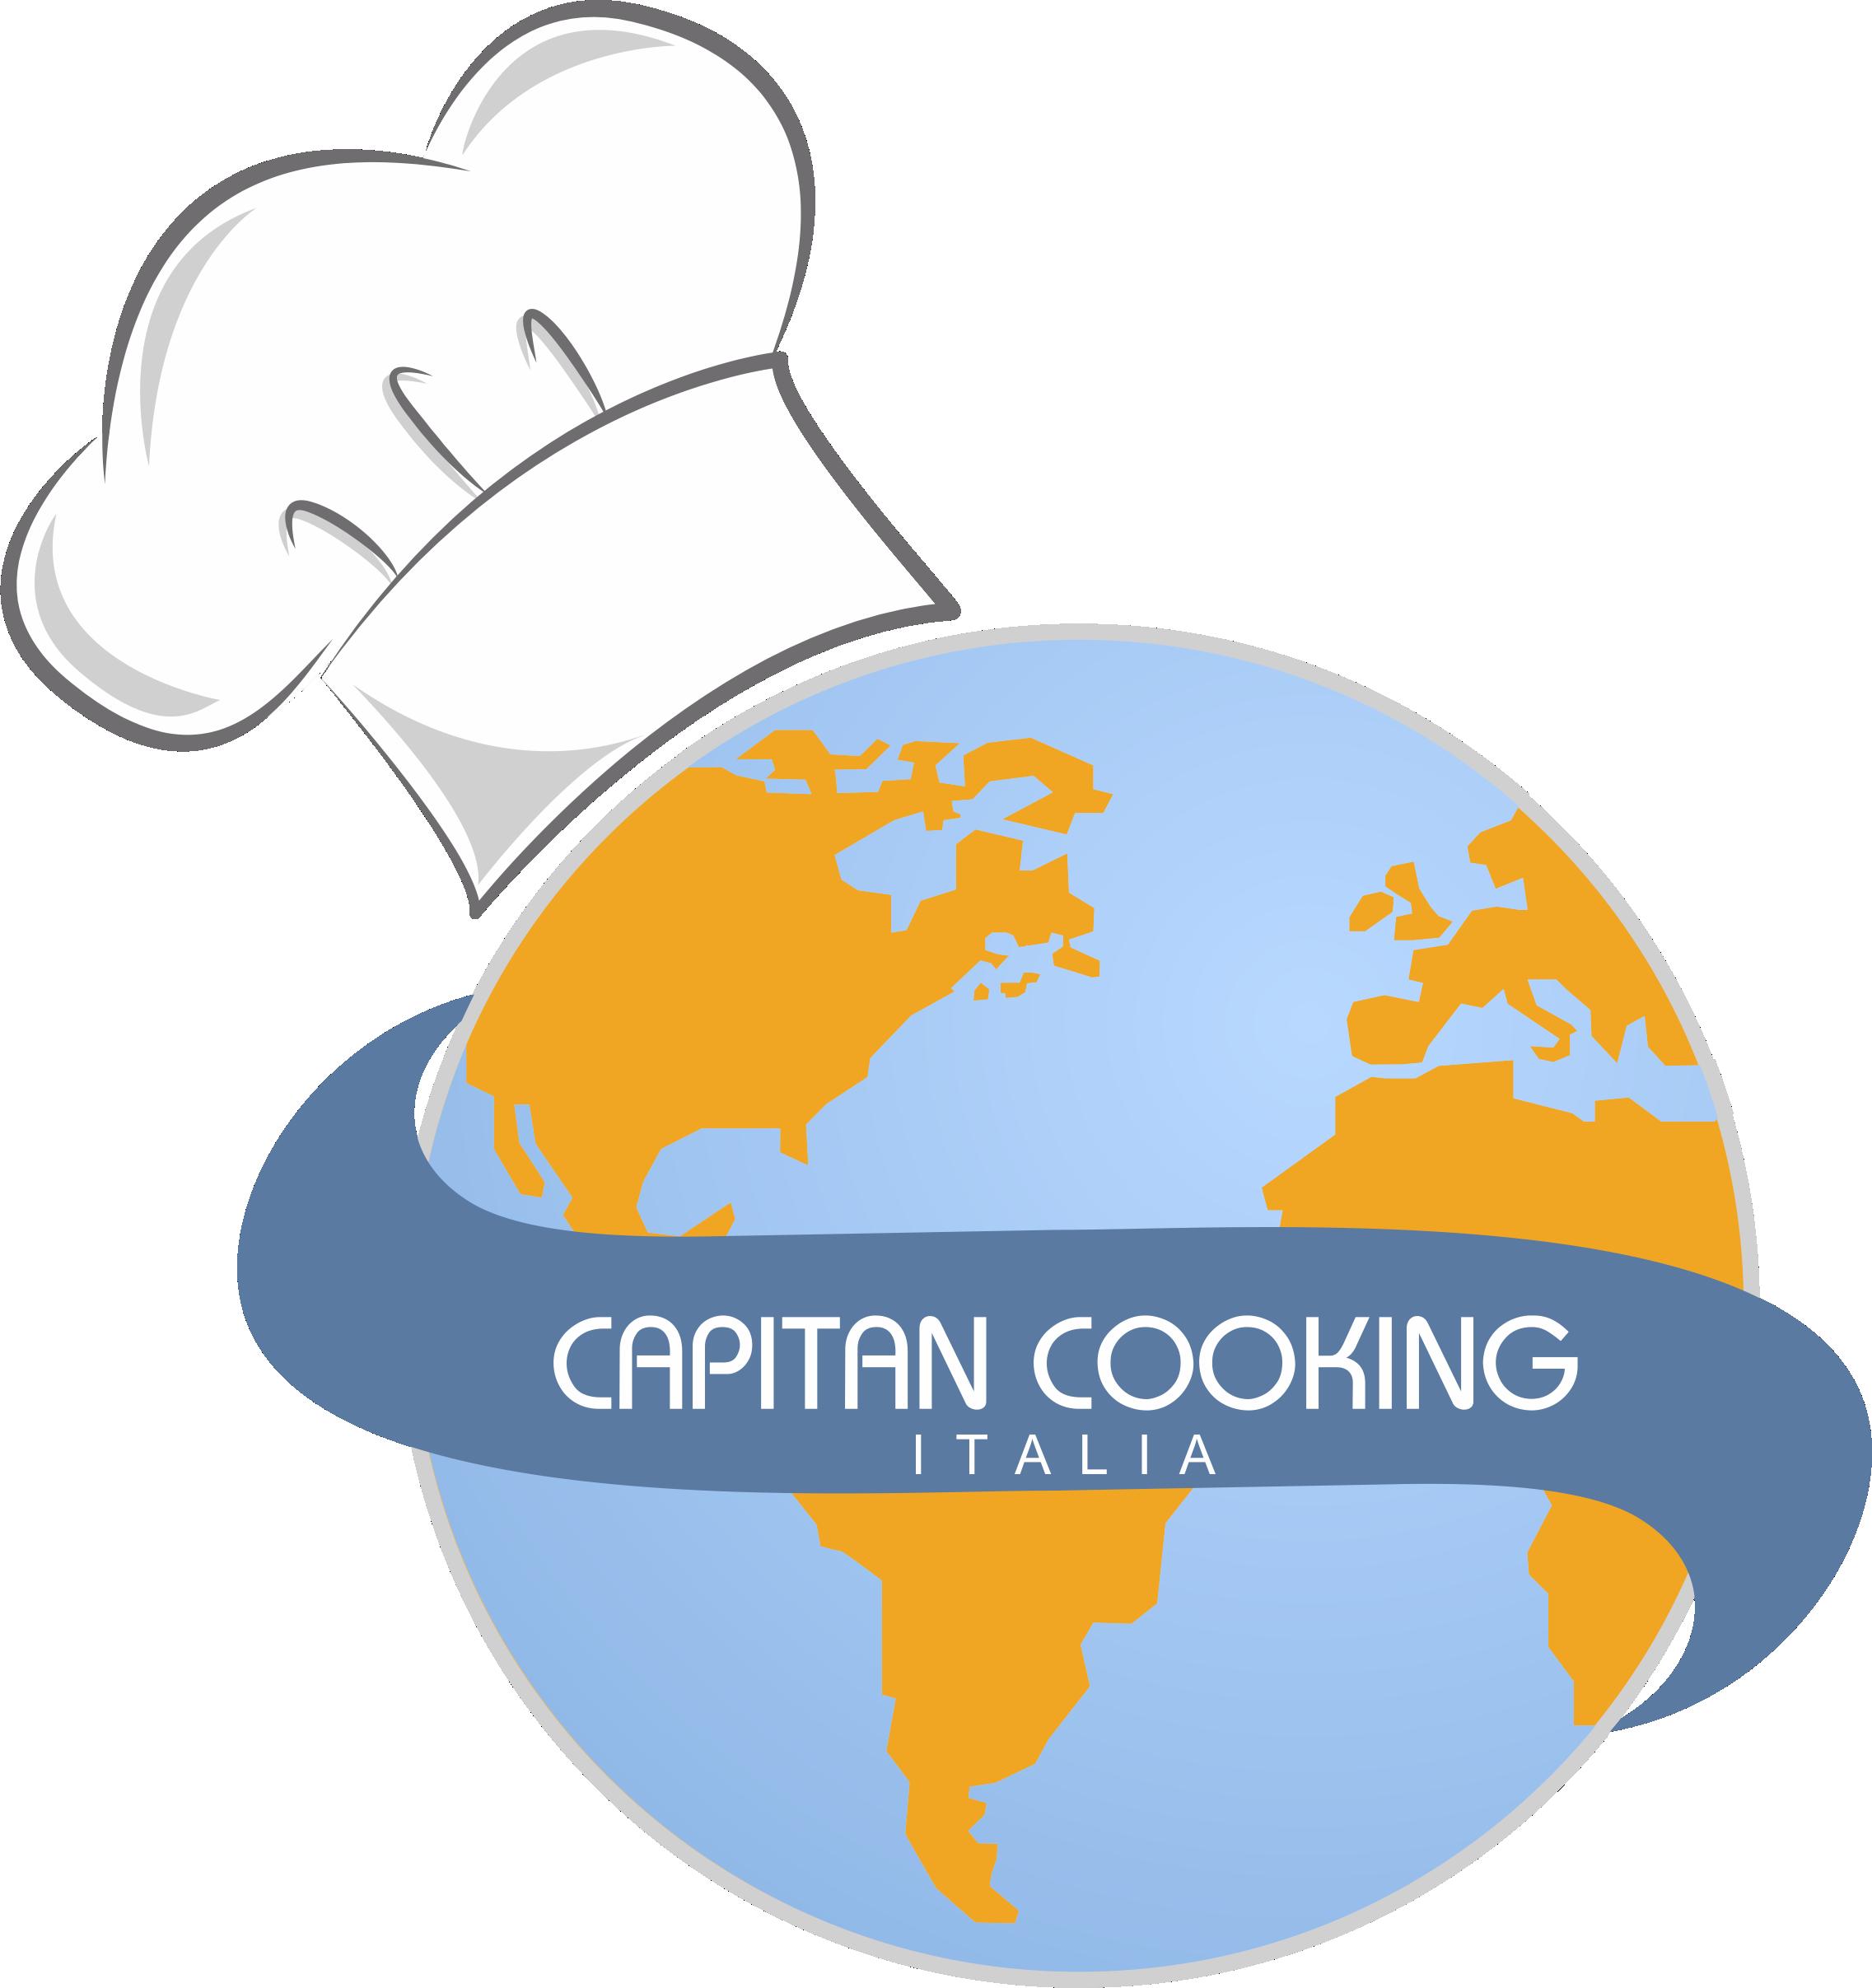 Capitan Cooking 4° Edizione 2018-AGG